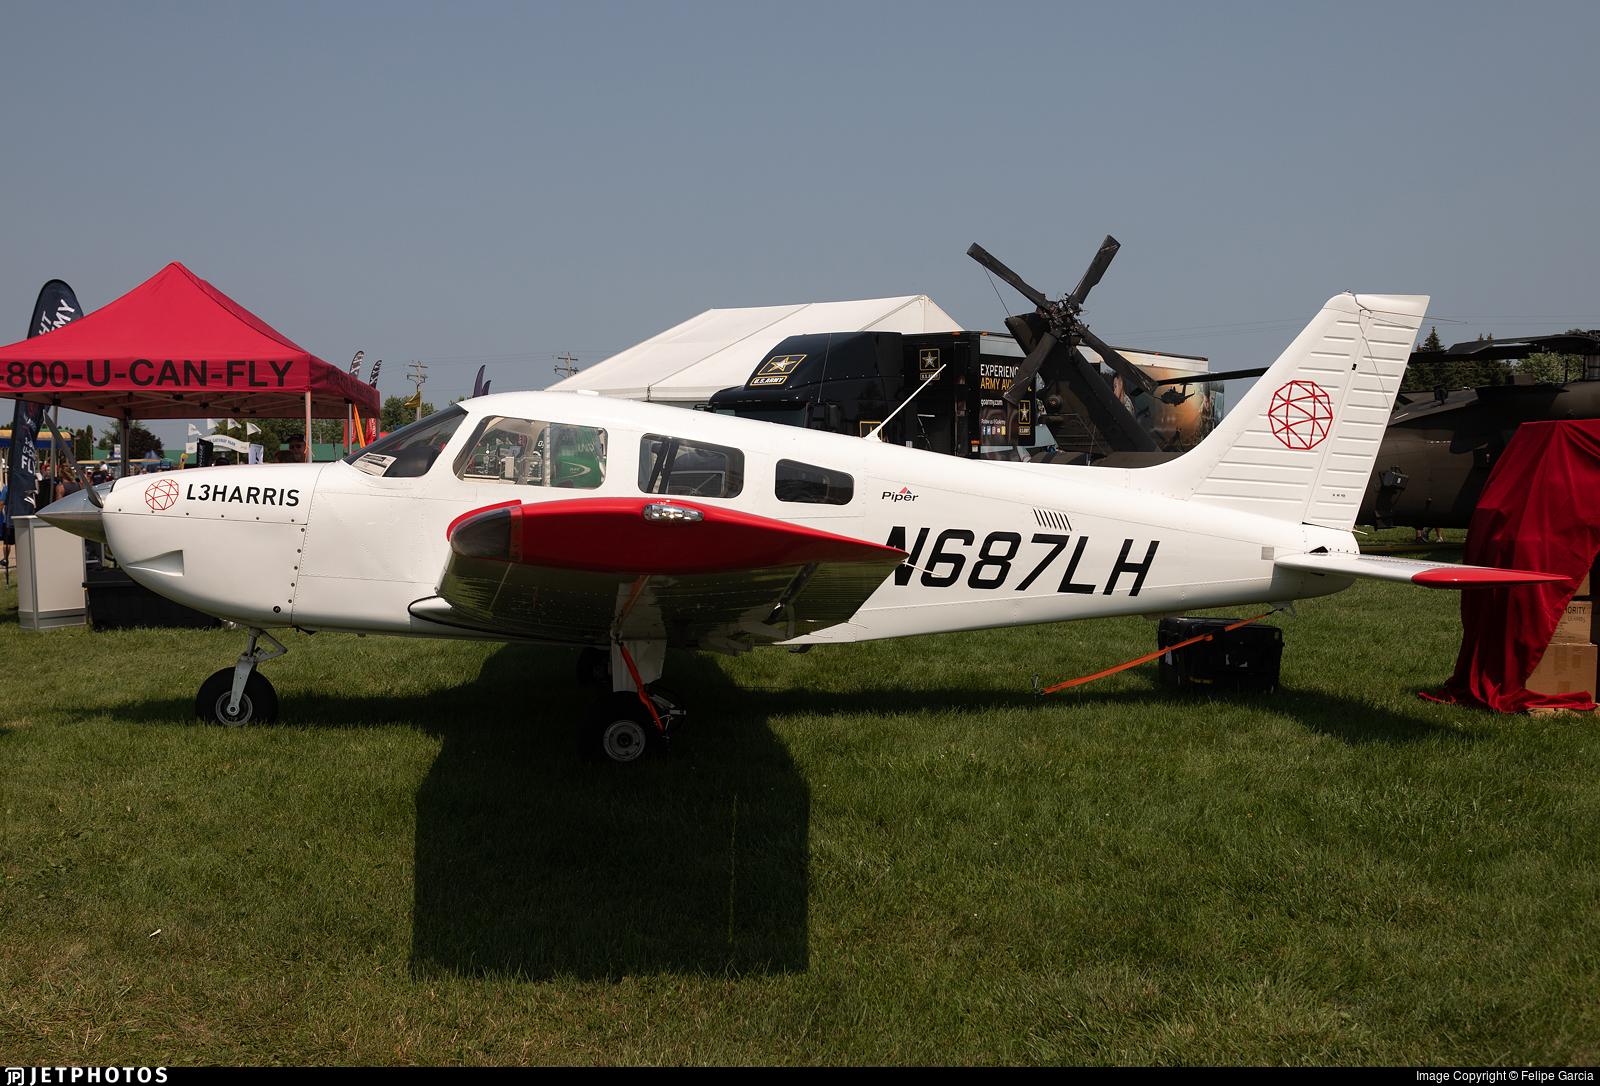 N687LH - Piper PA-28-181 Archer TX - L3Harris